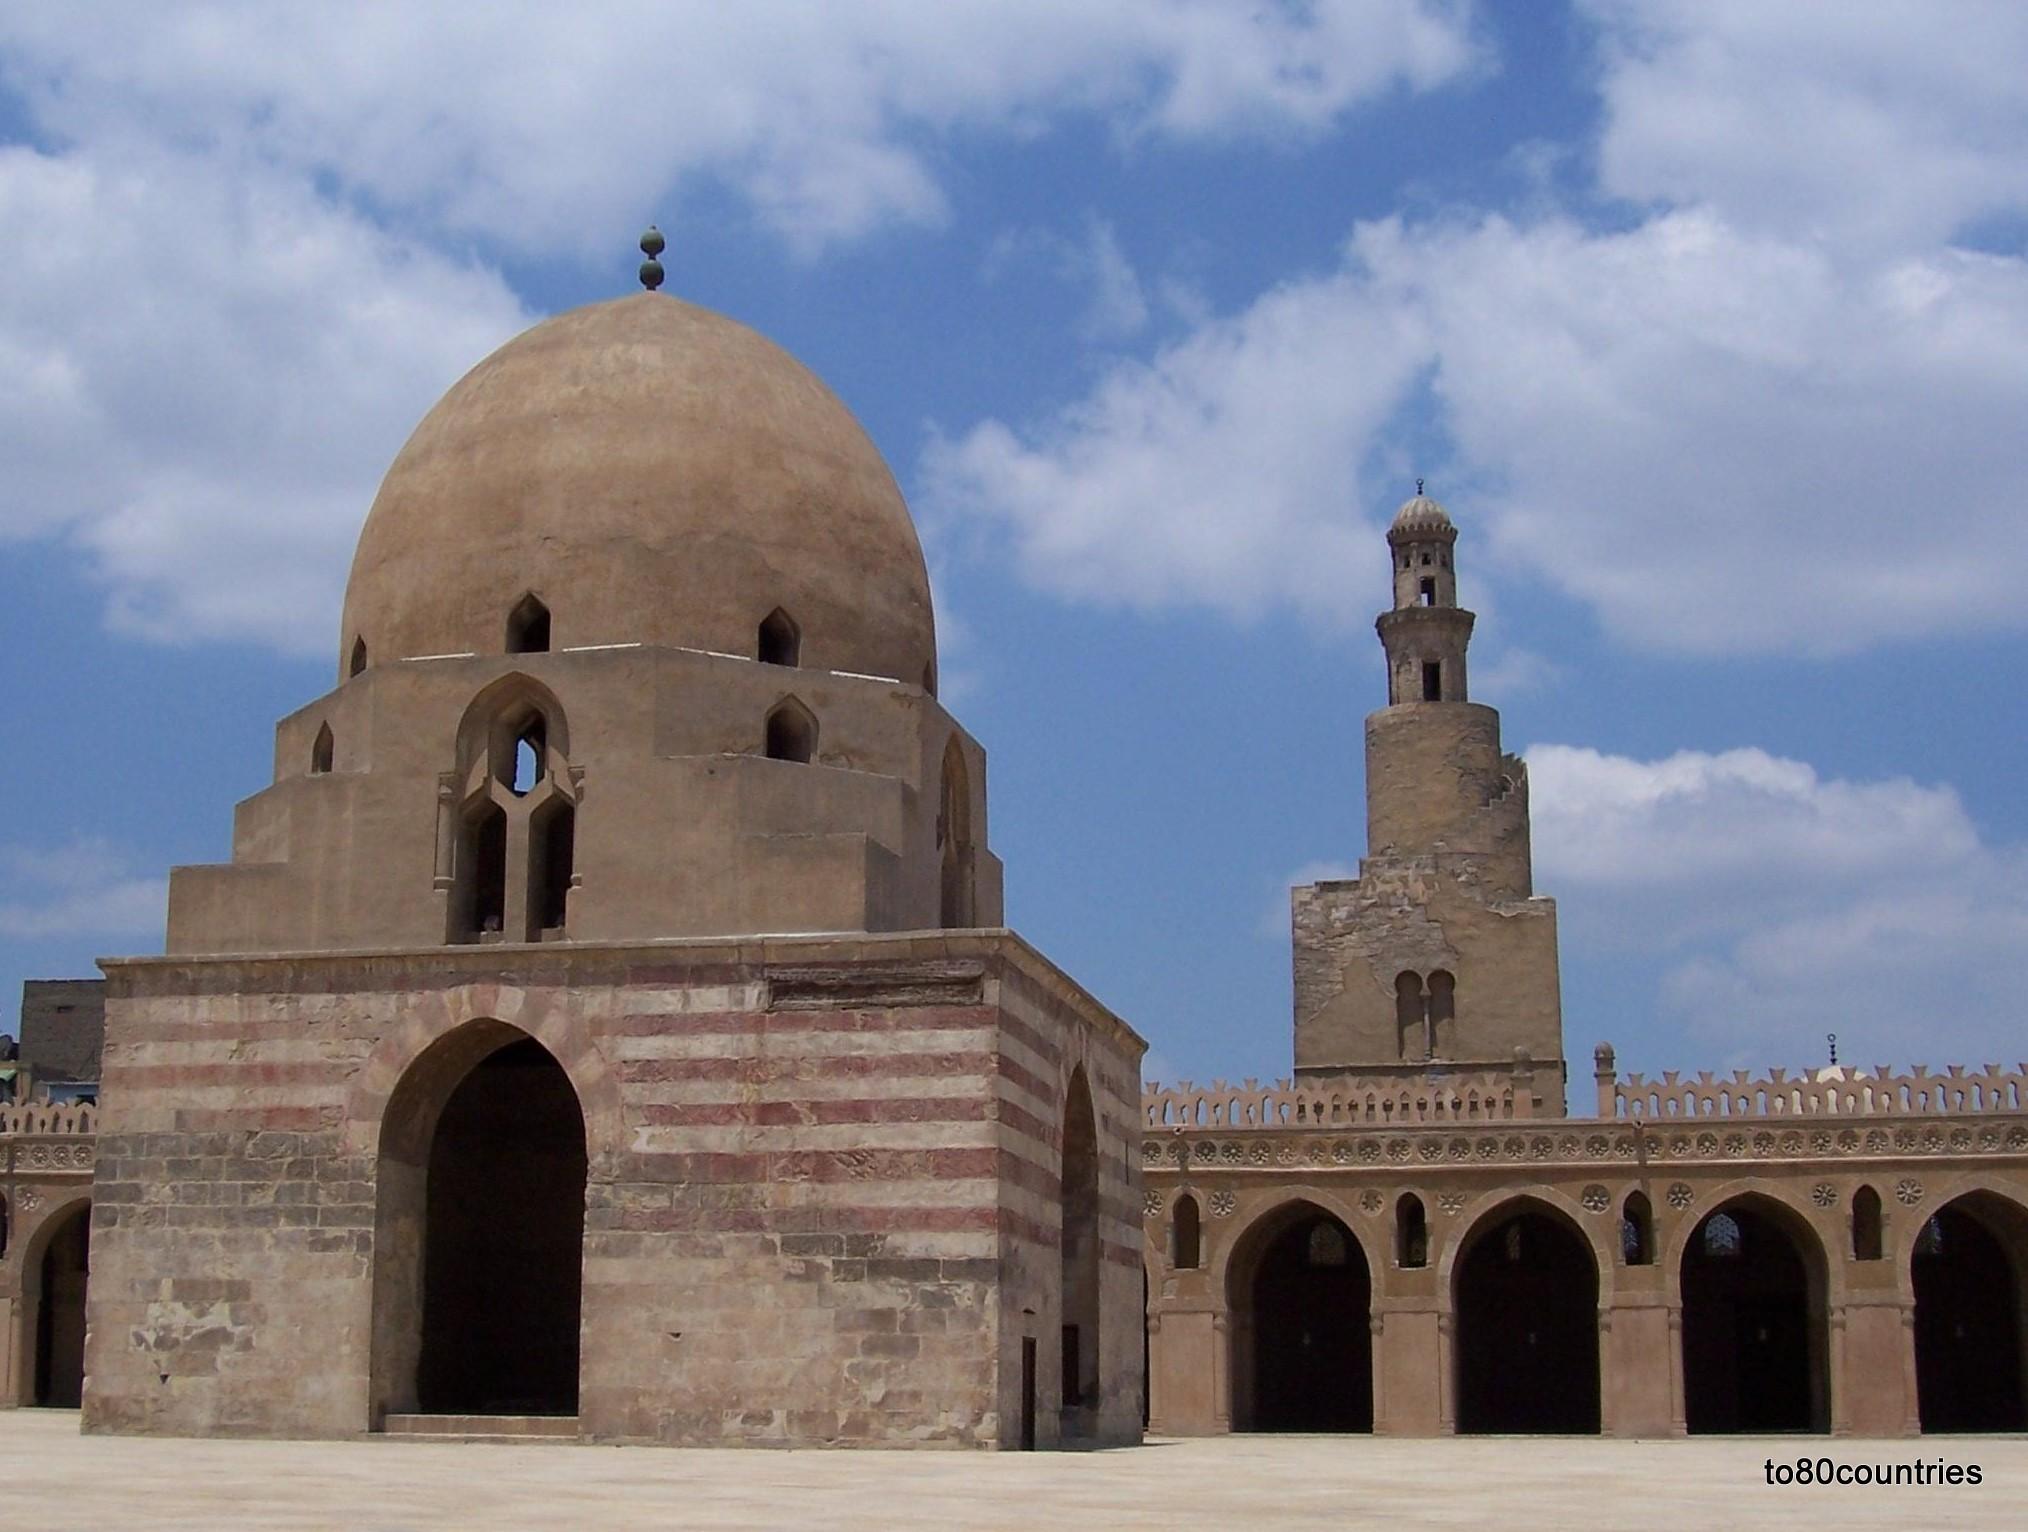 Ibn-Tulun-Moschee in Kairo